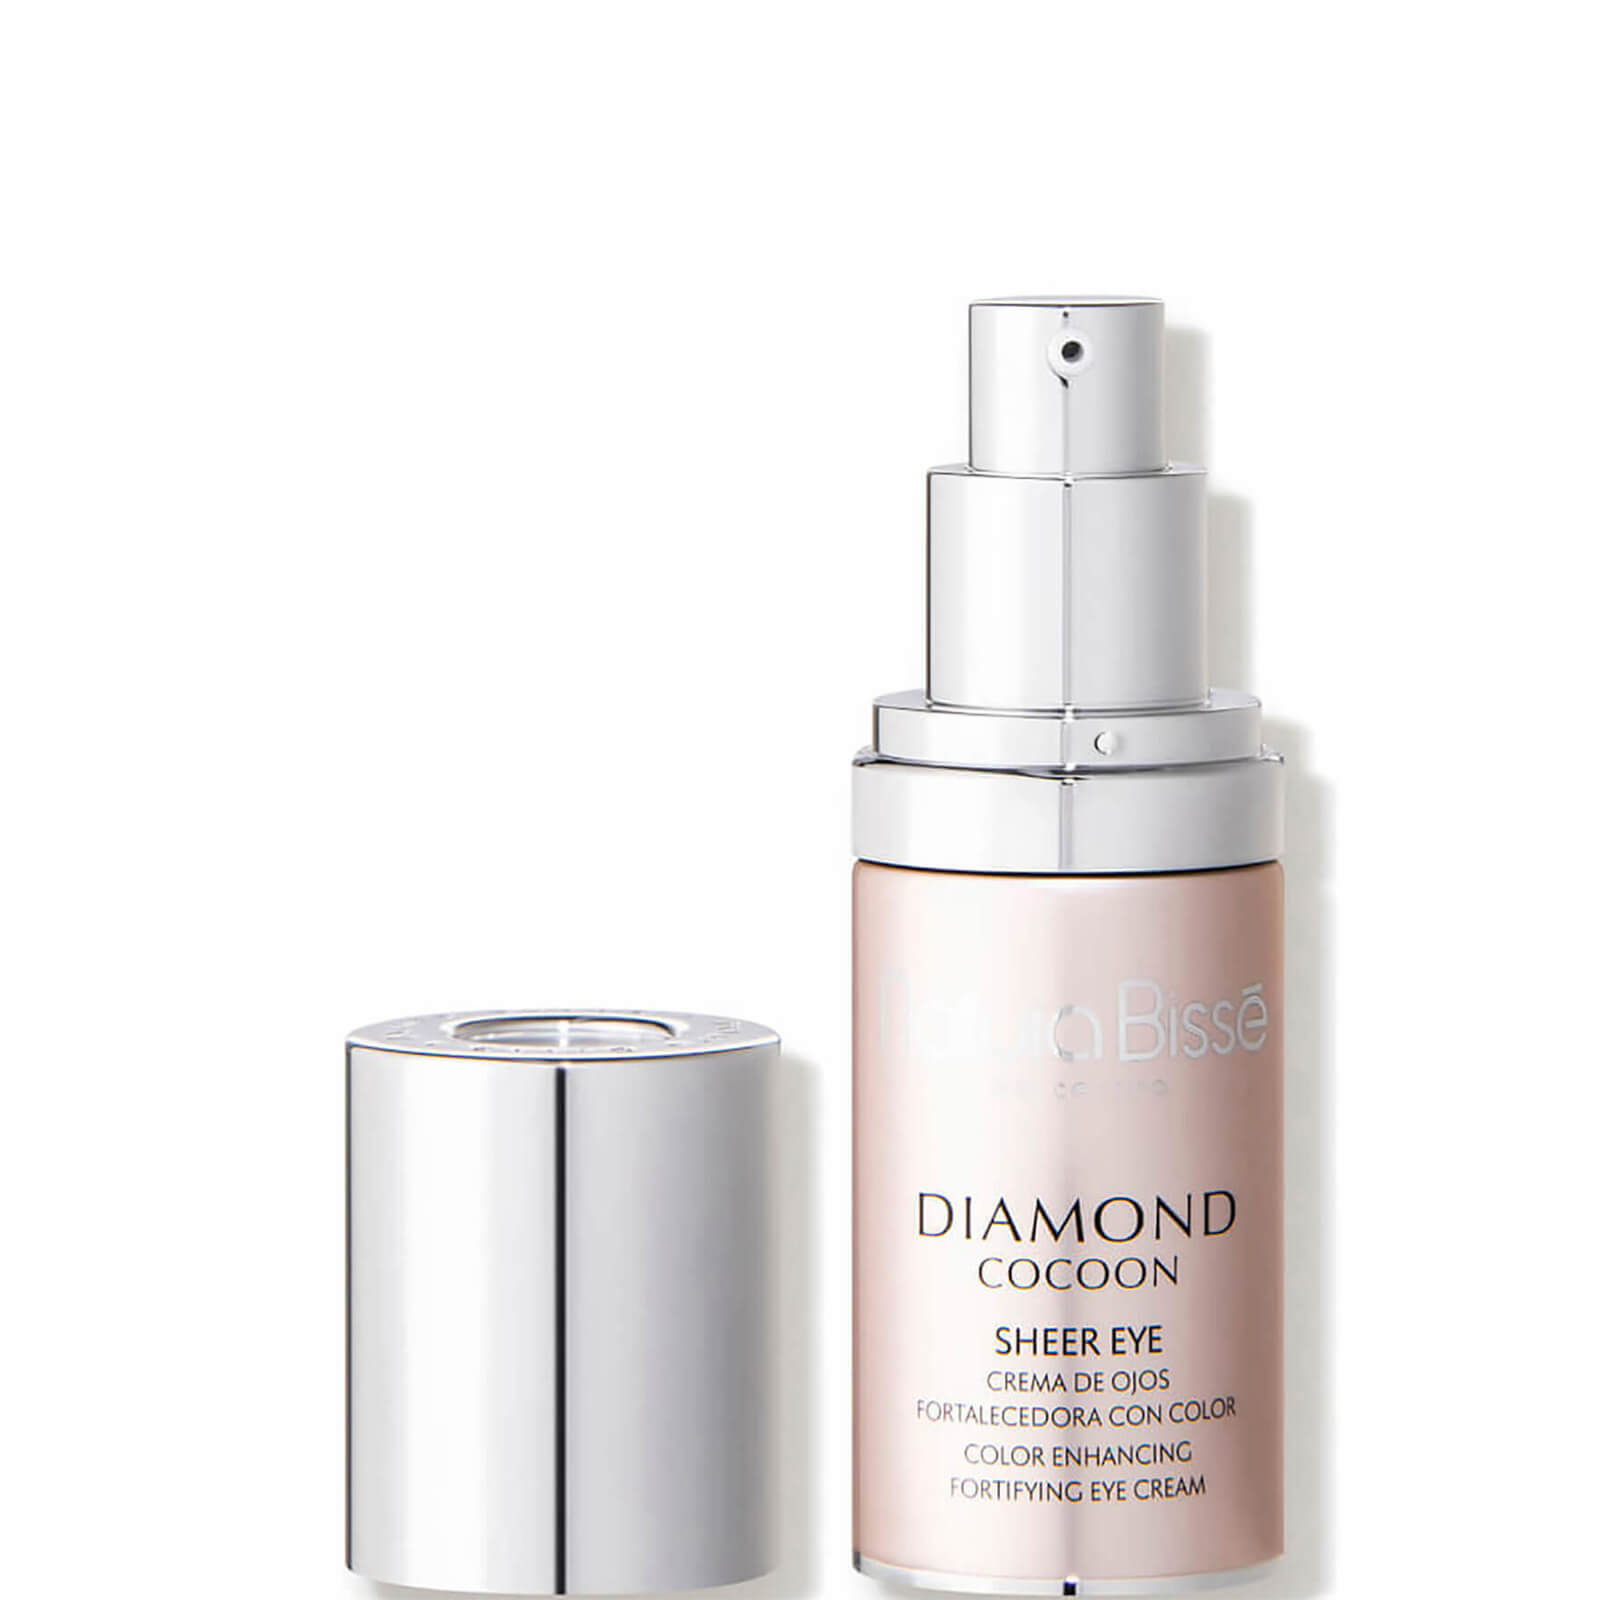 Купить Natura Bissé Diamond Cocoon Sheer Eye Cream 25ml